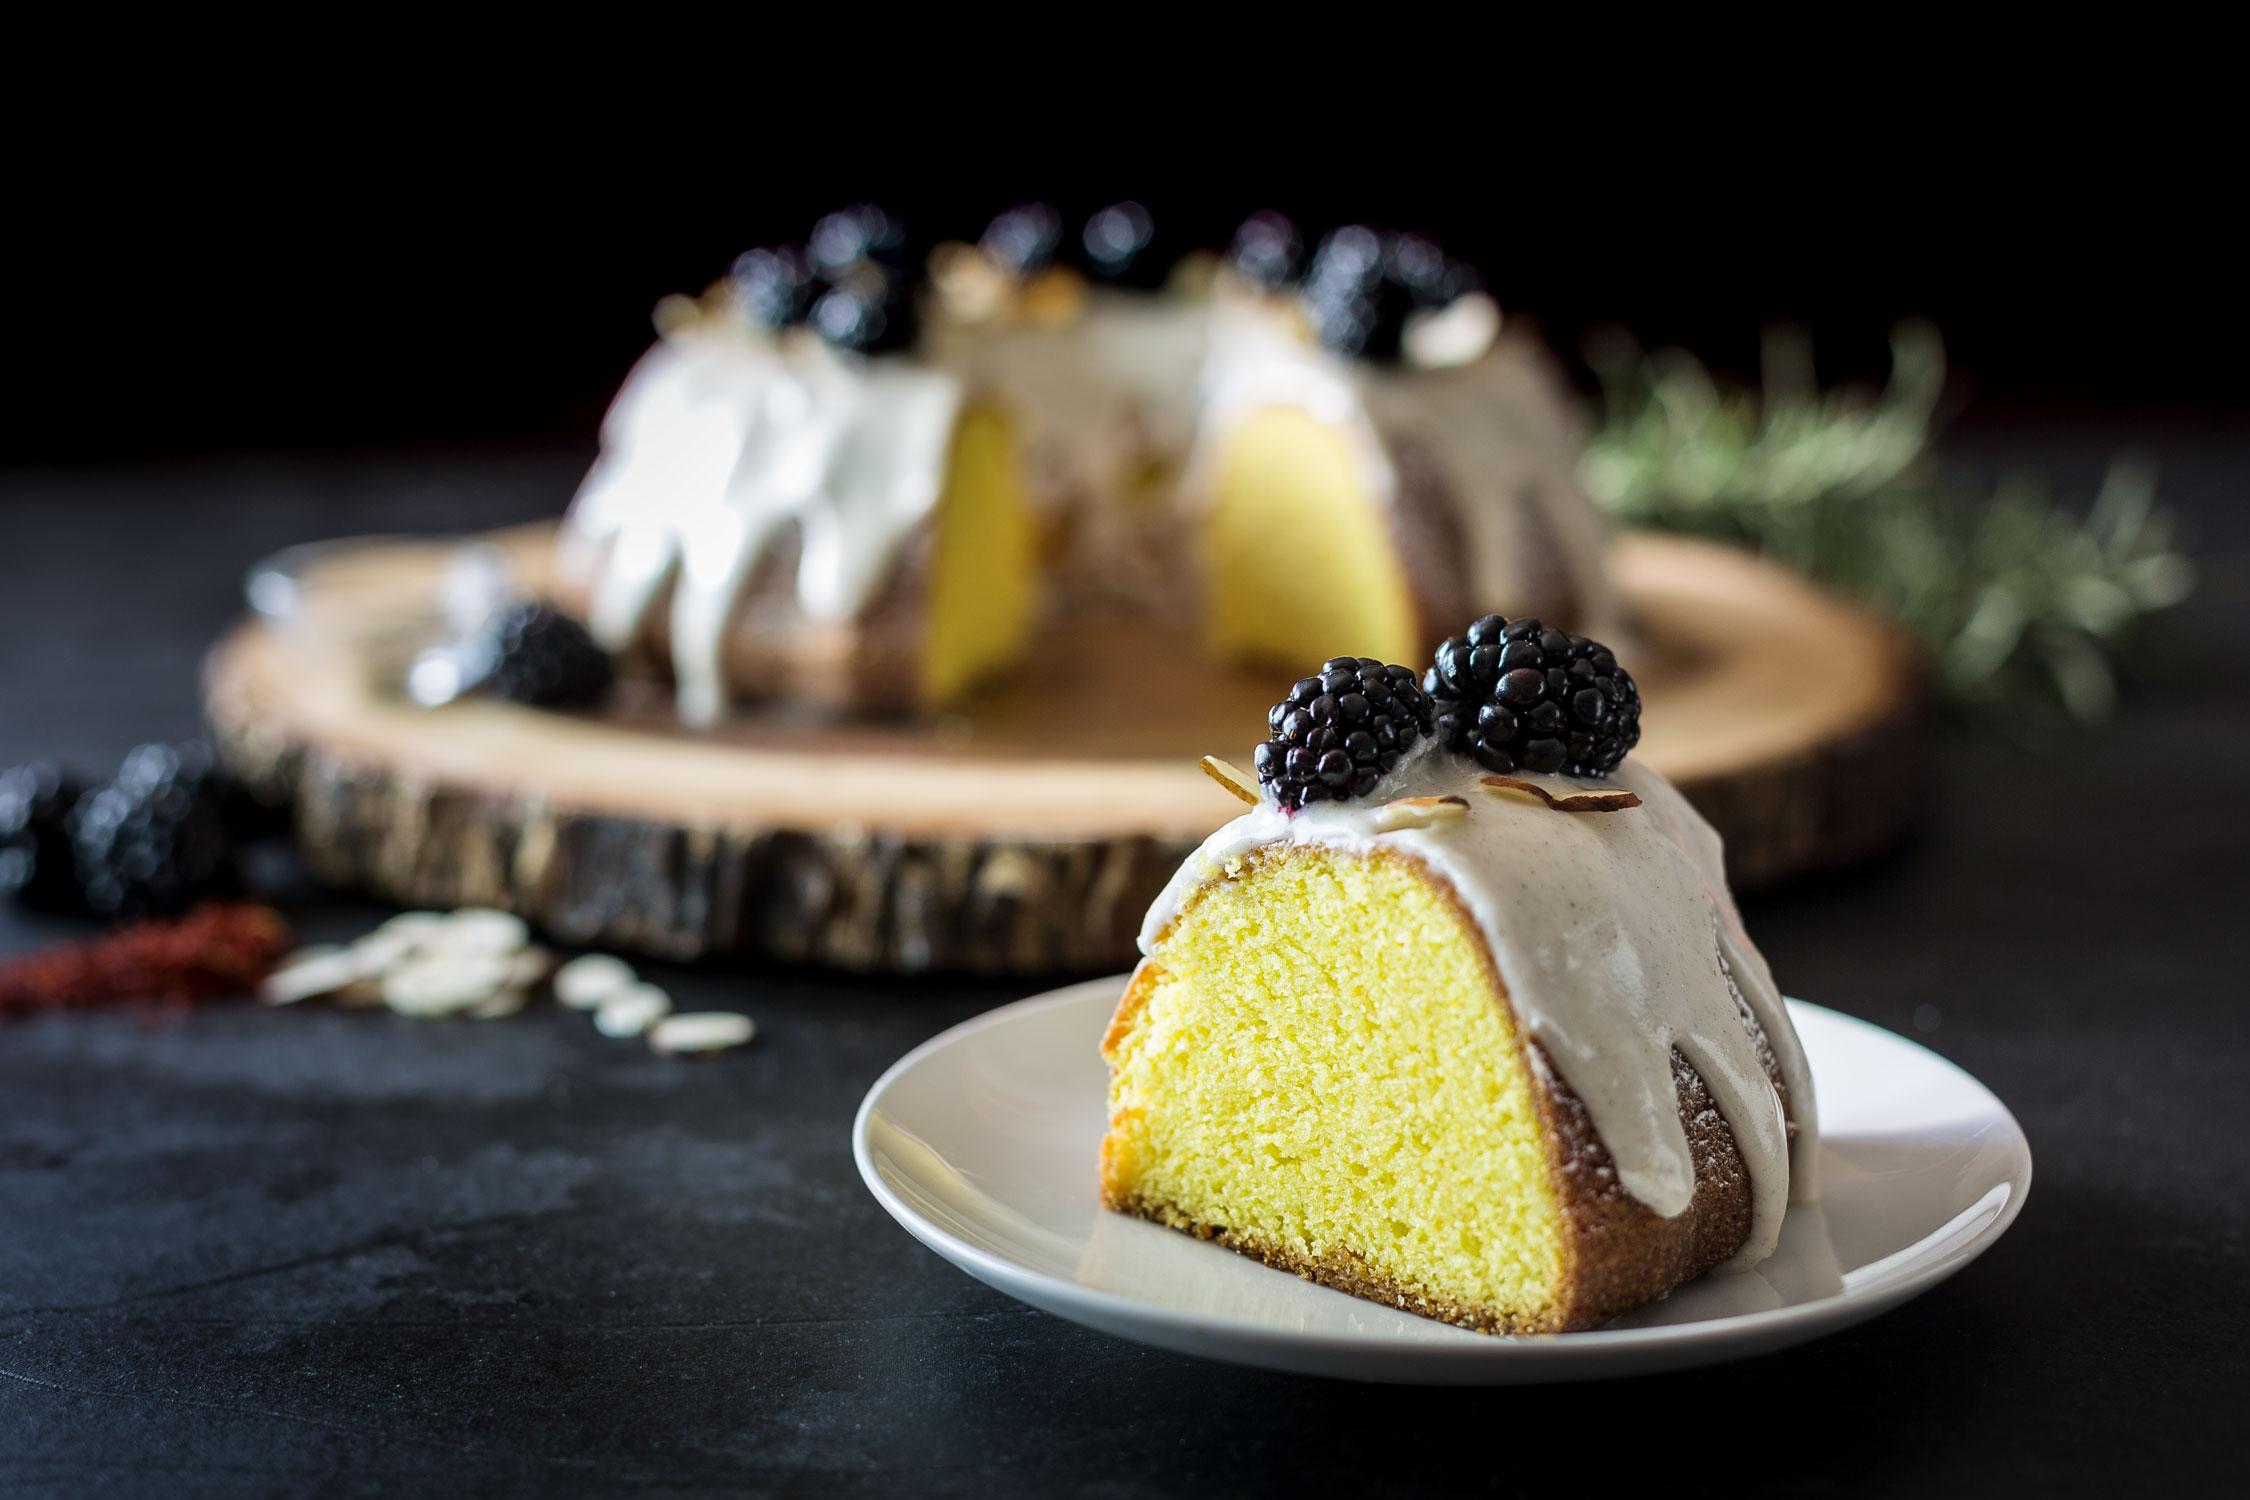 Saffron Bundt Cake with Cardamom Glaze by Sam Henderson of Today's Nest